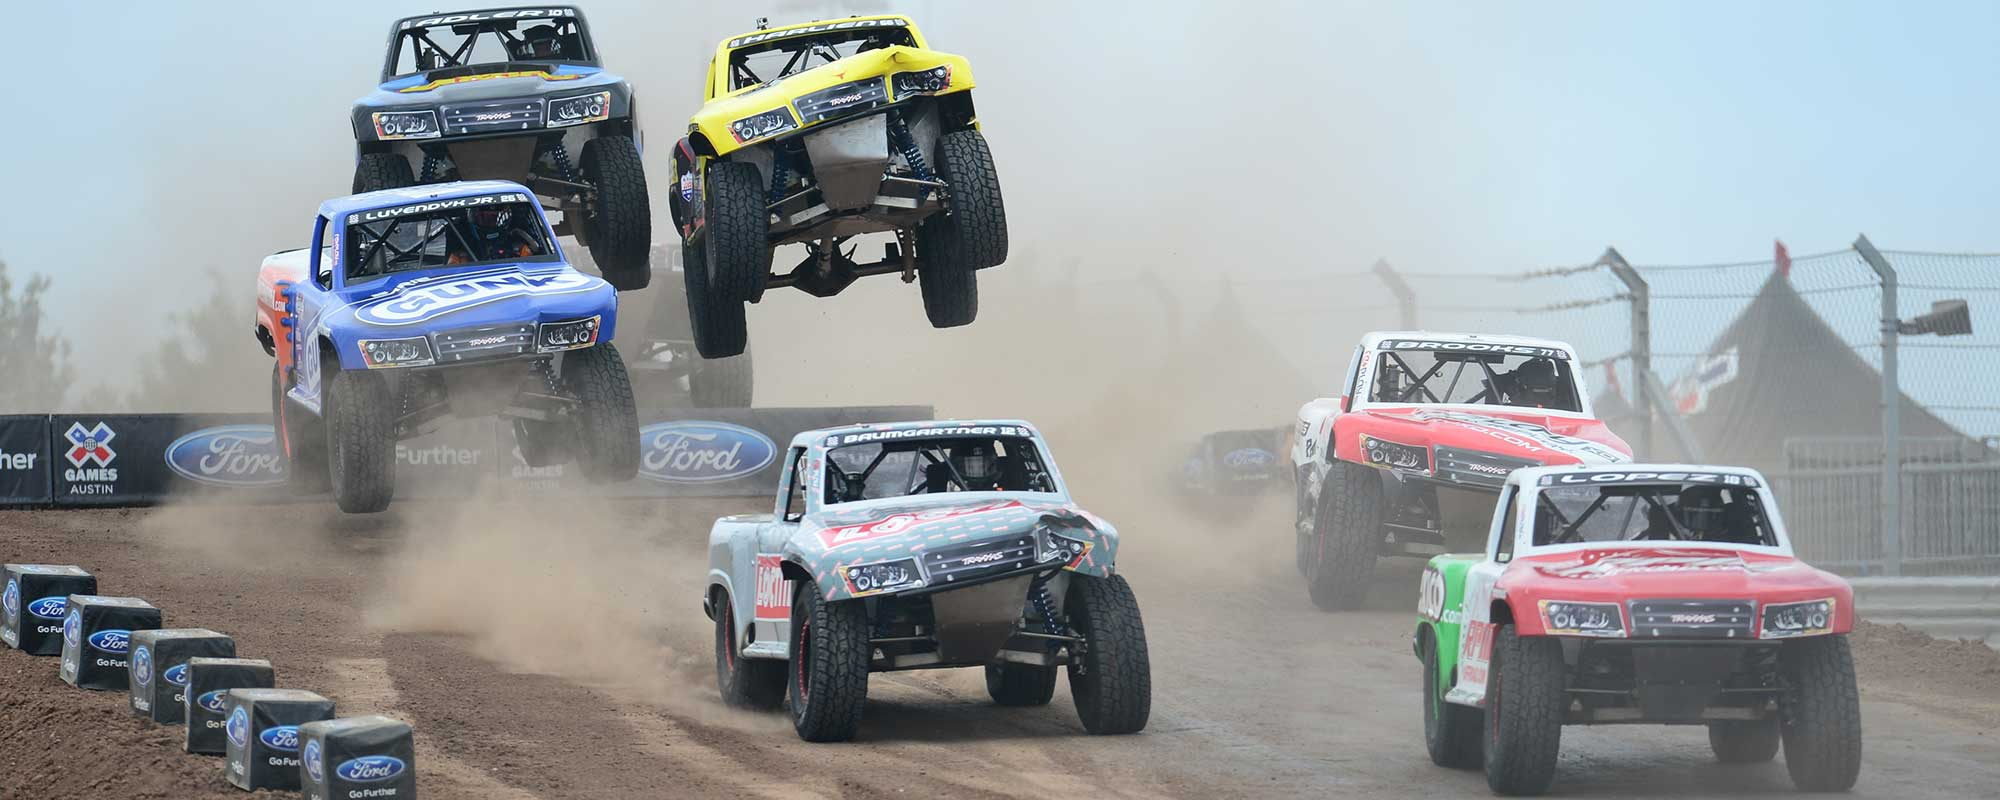 Off-road truck racing at X Games Austin 2014